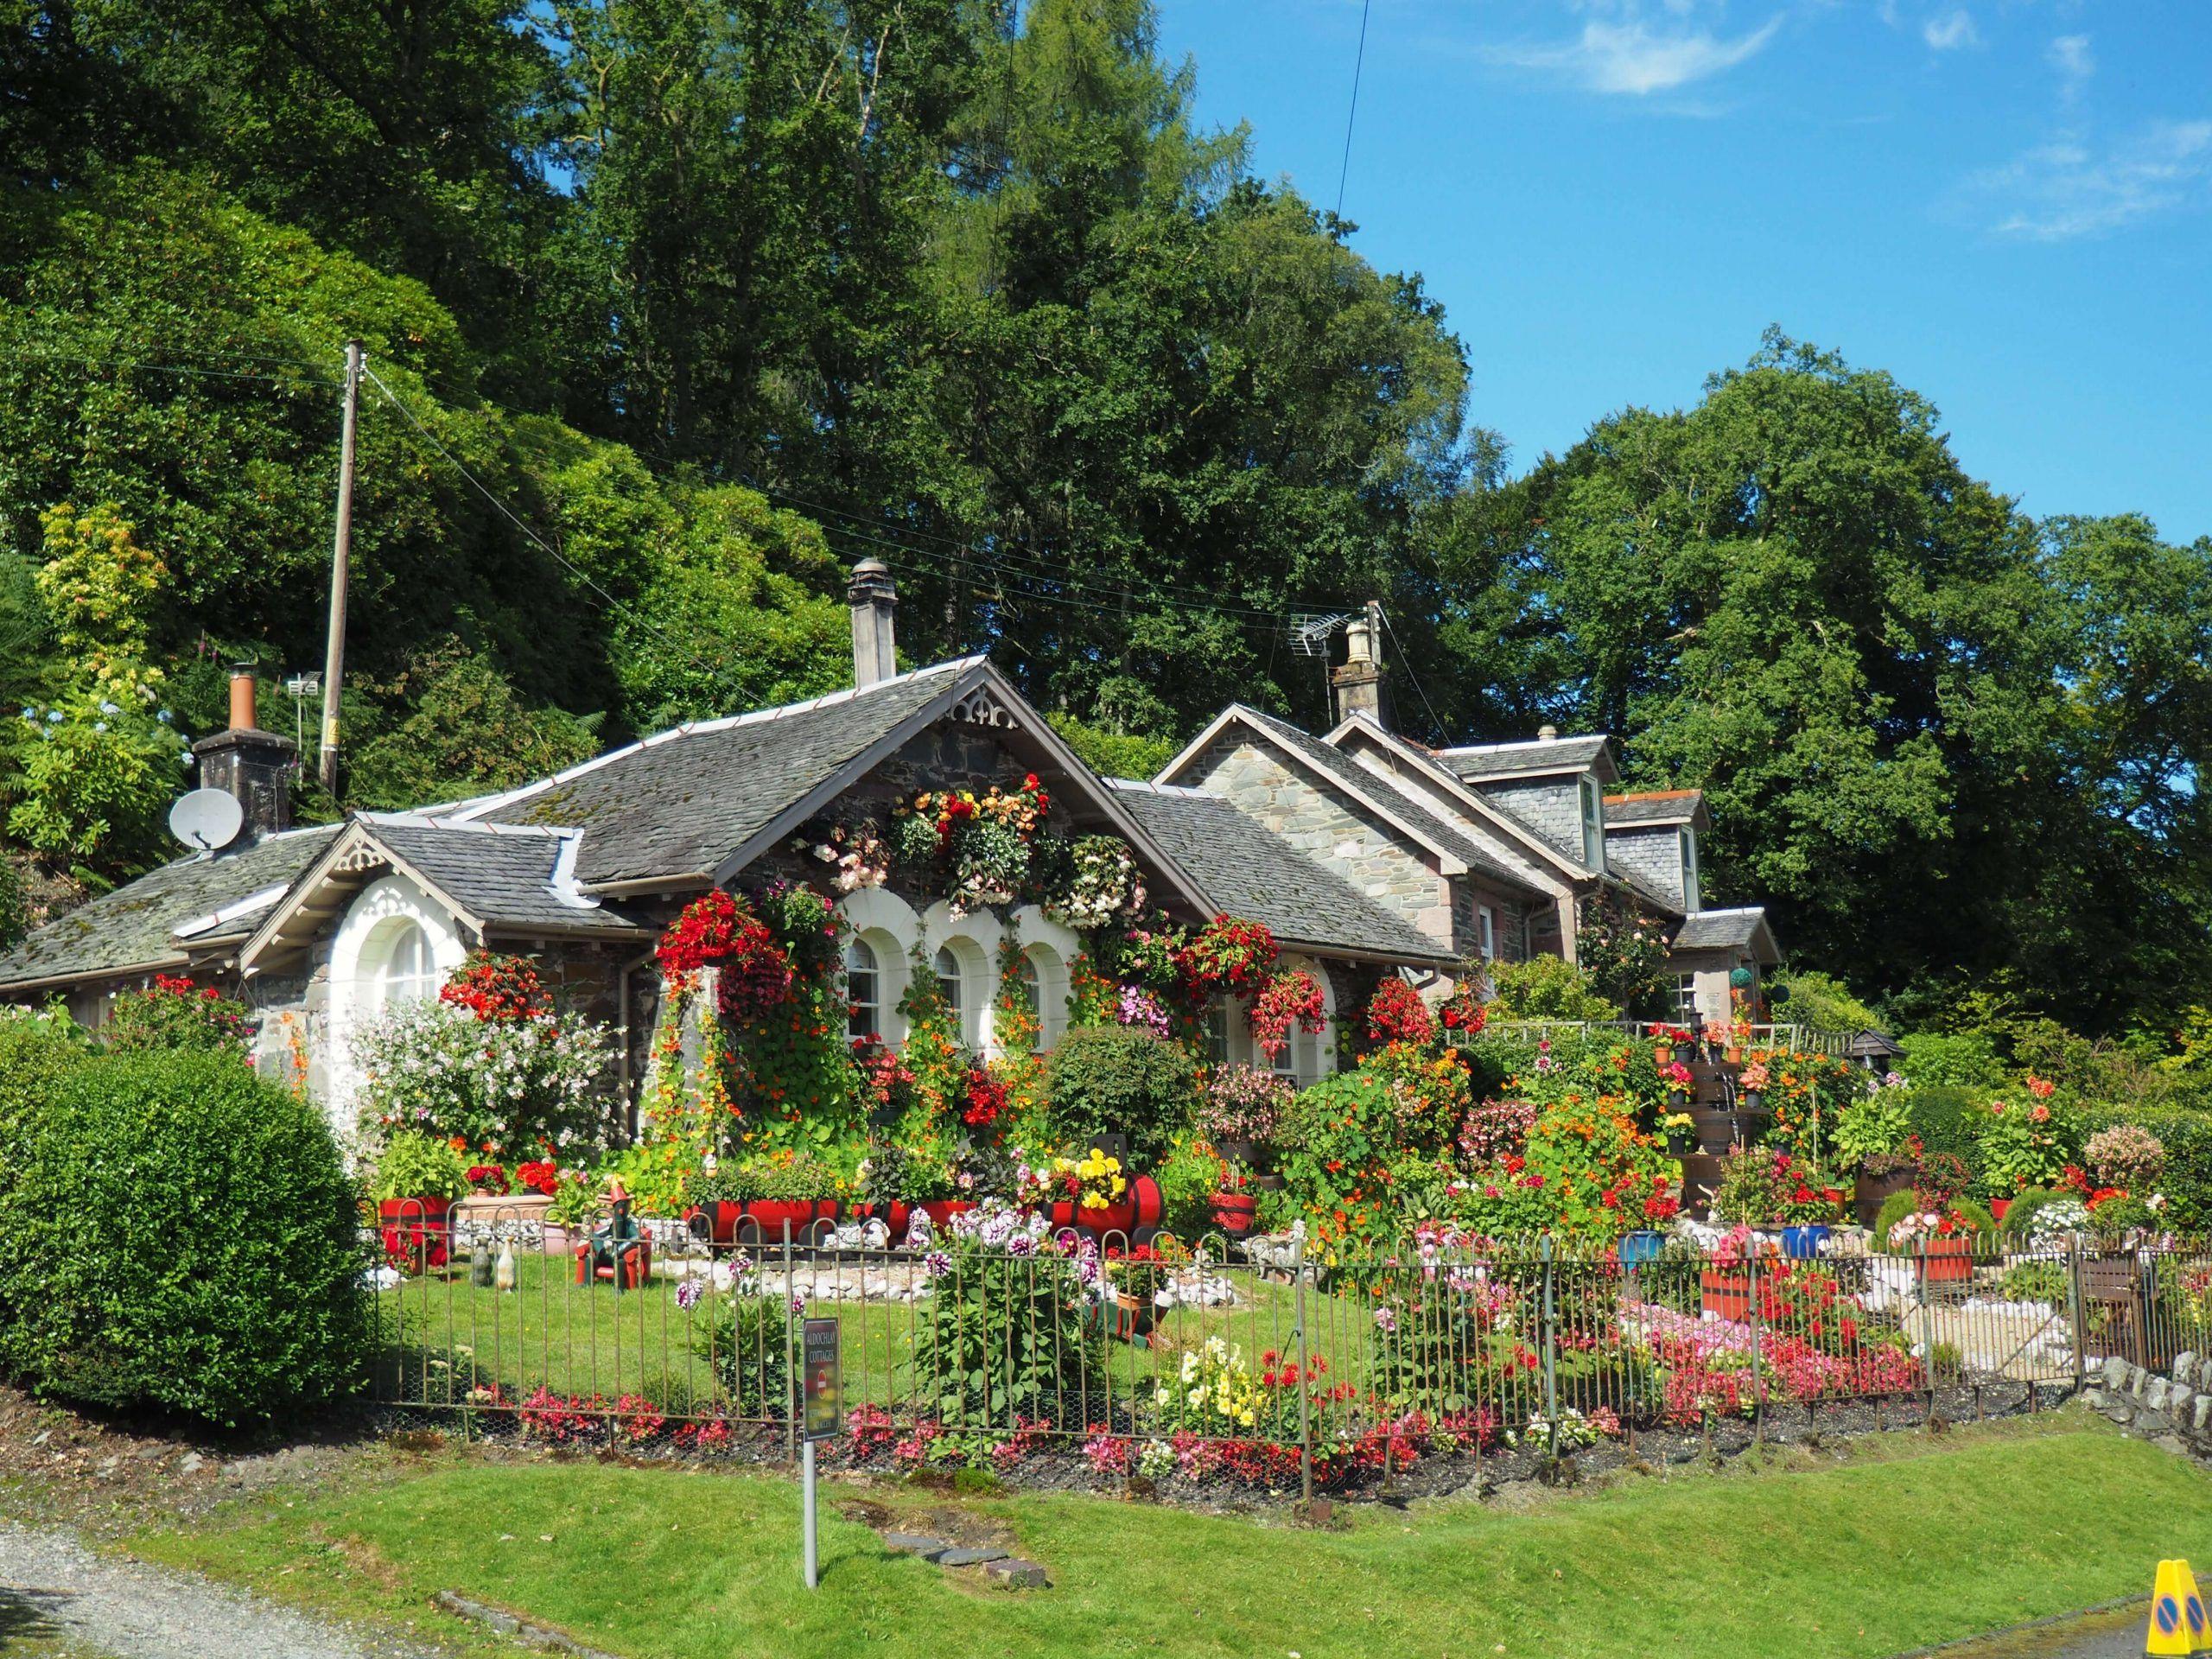 garden shrubs and flowers